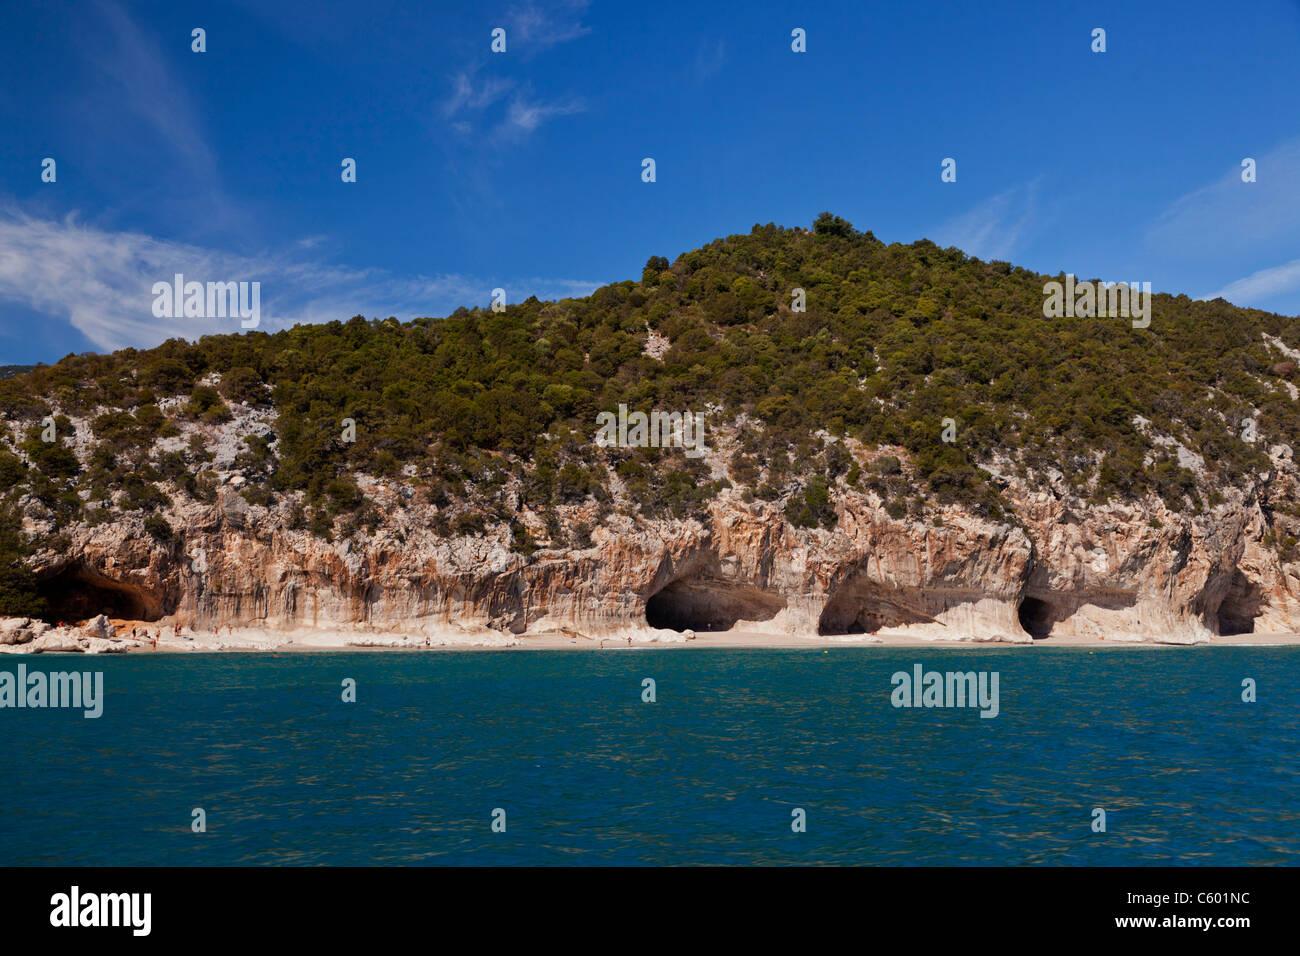 Cala Luna Sardinia Italy landscape ocean sky blue people Hoehle cave - Stock Image